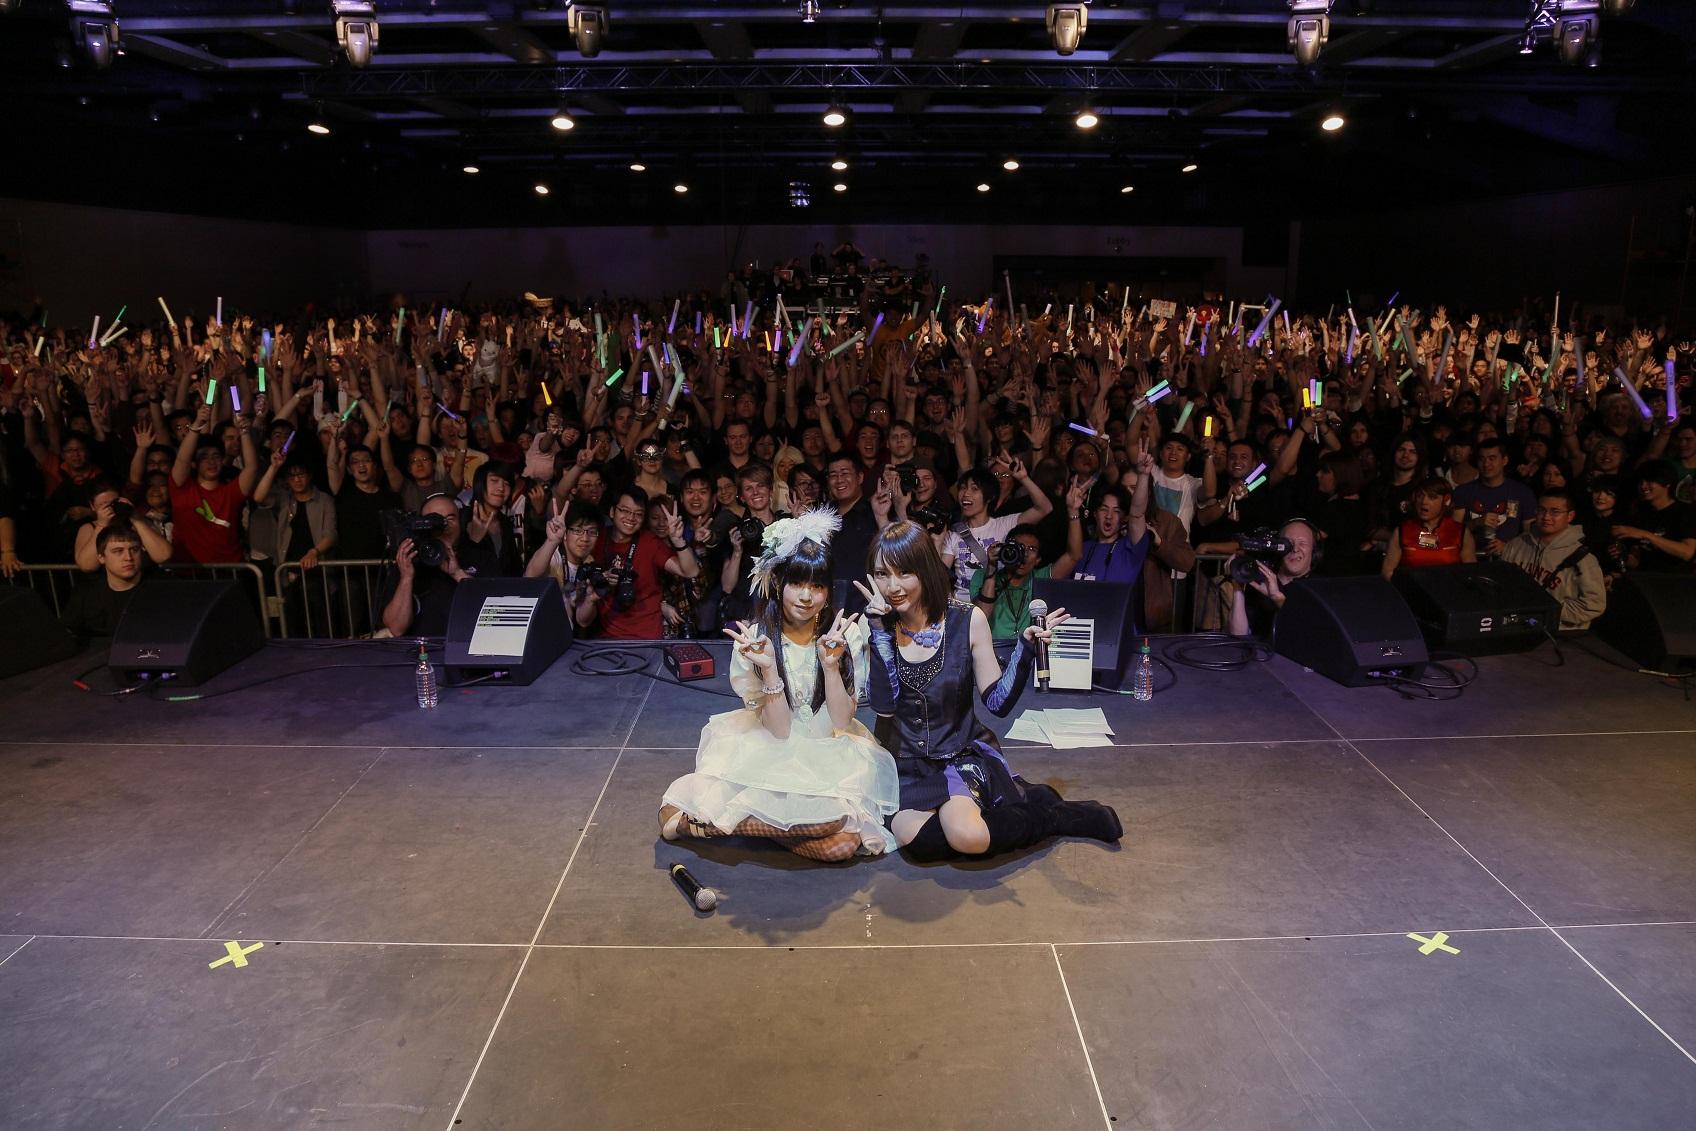 Haruna Luna & Eir Aoi Sakura- Concert 2013 (via Lisani)